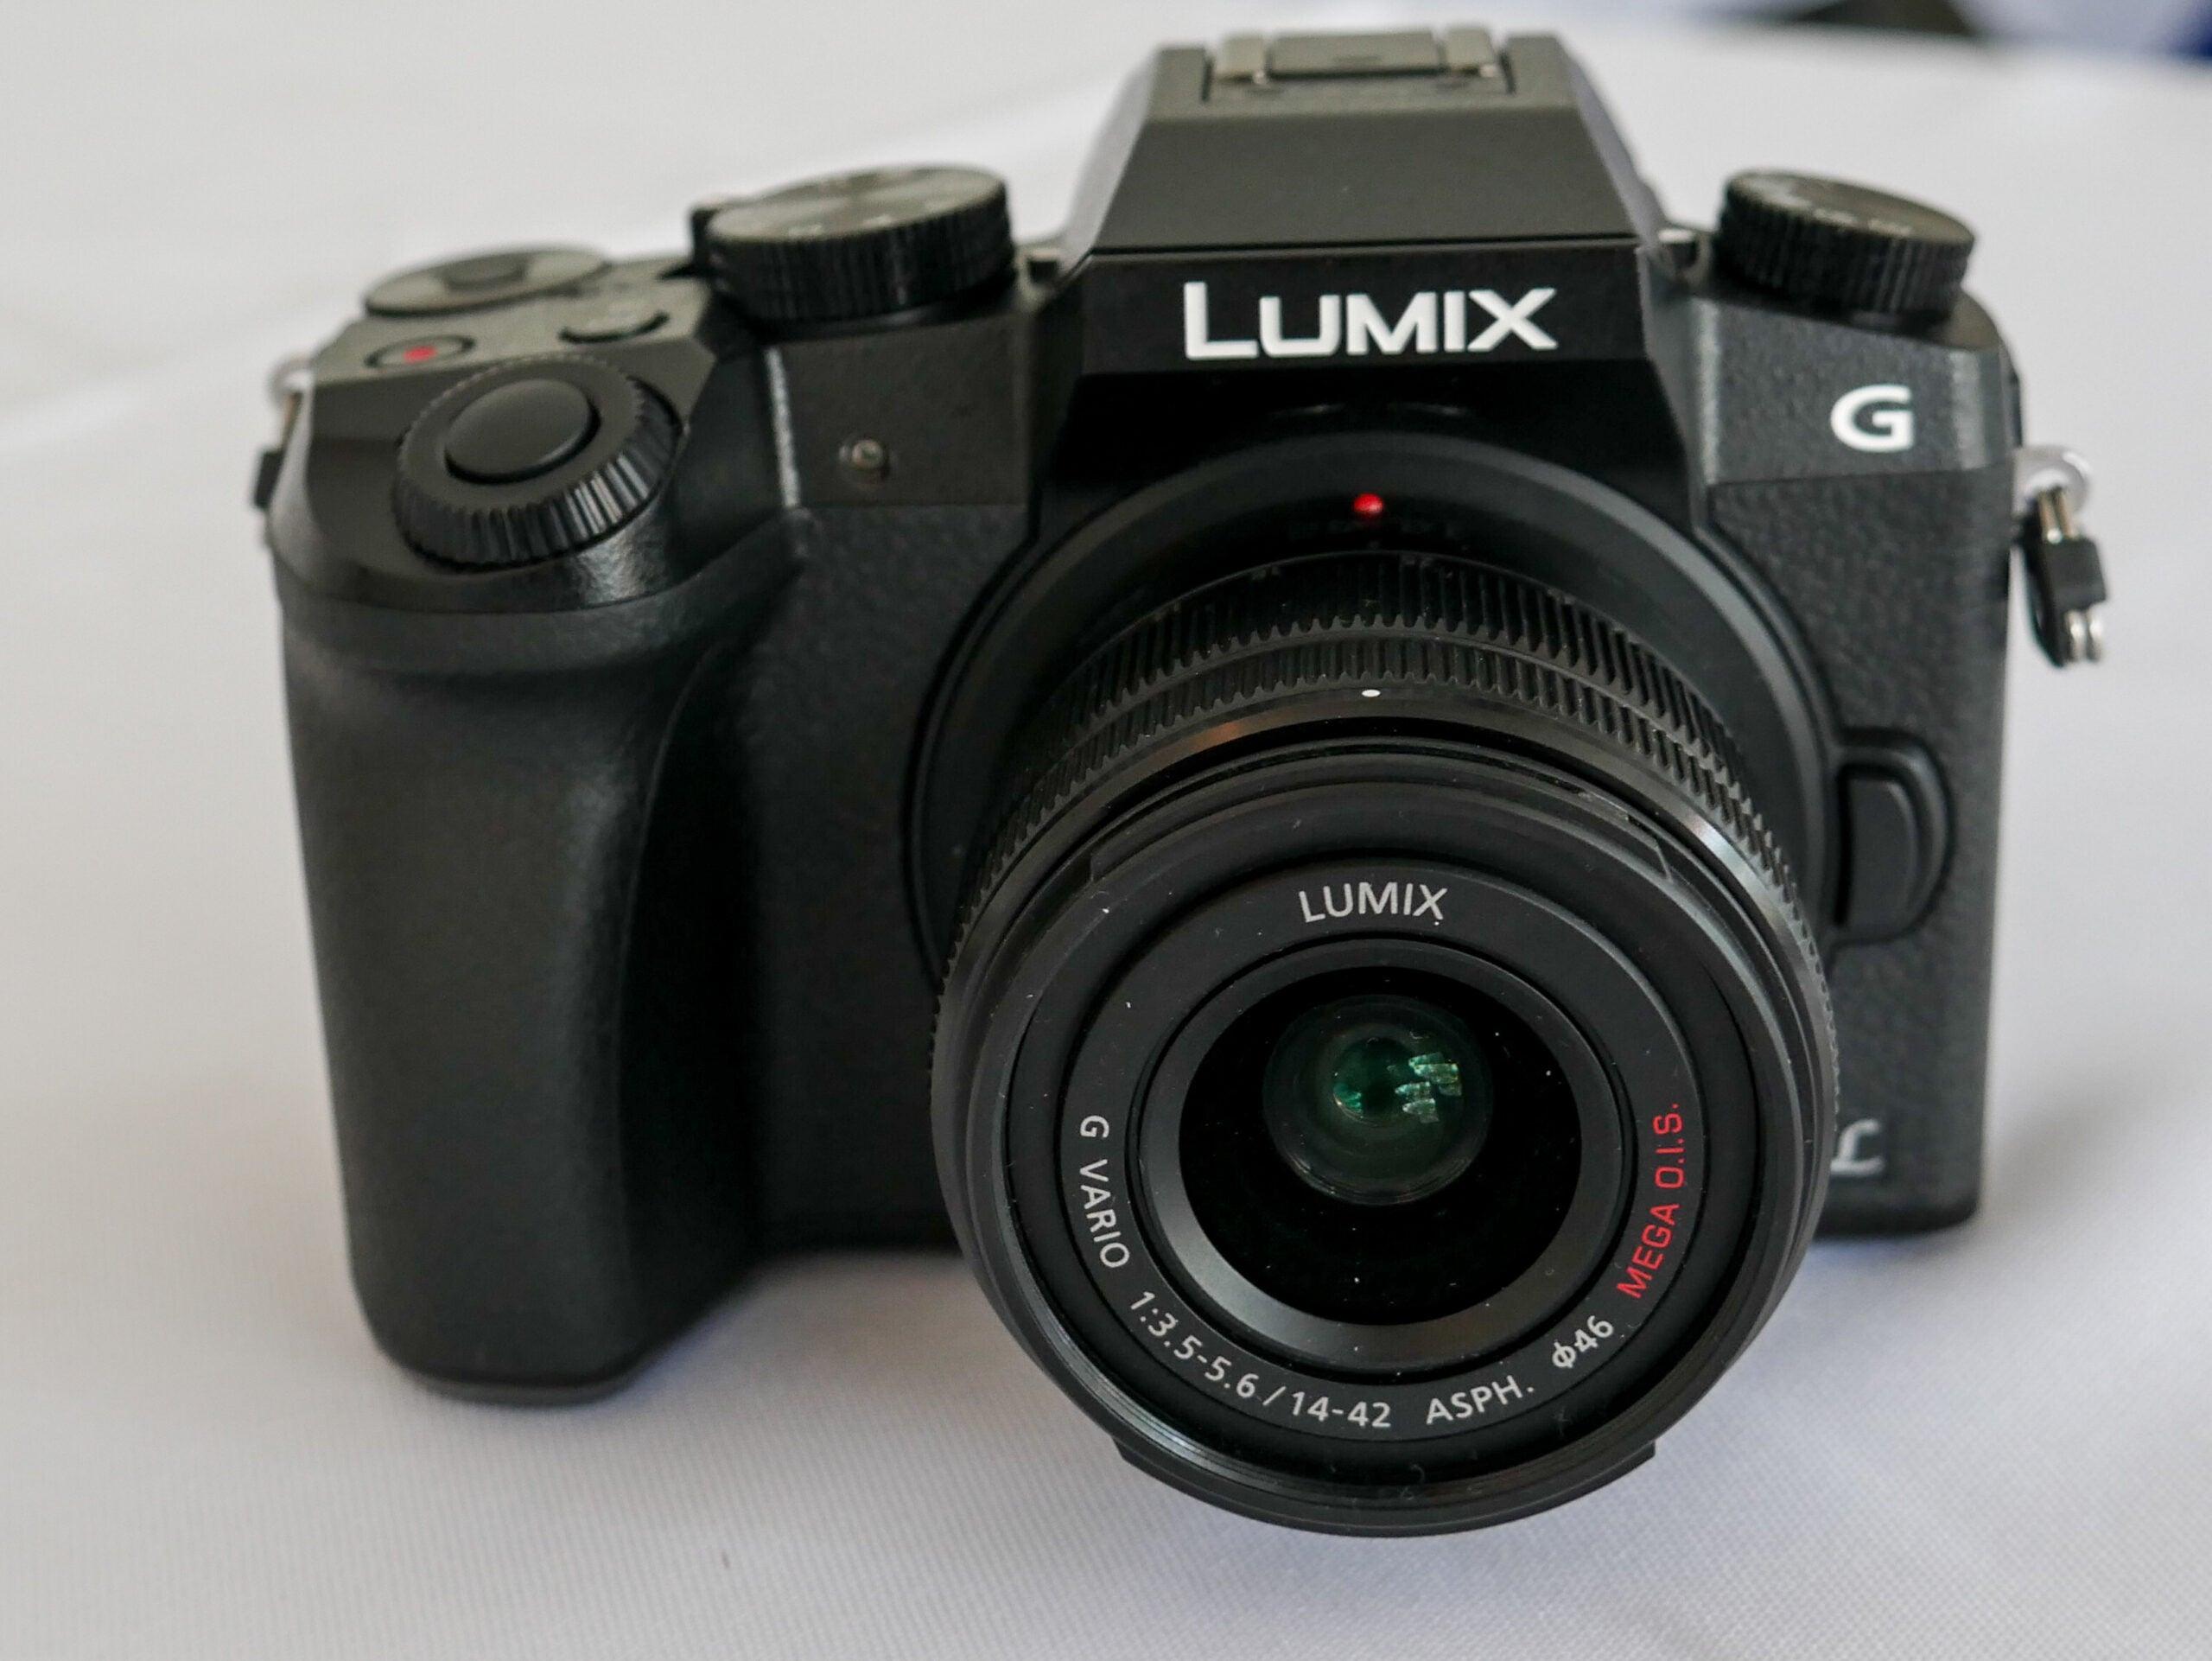 Hands On: Panasonic Lumix DMC-G7